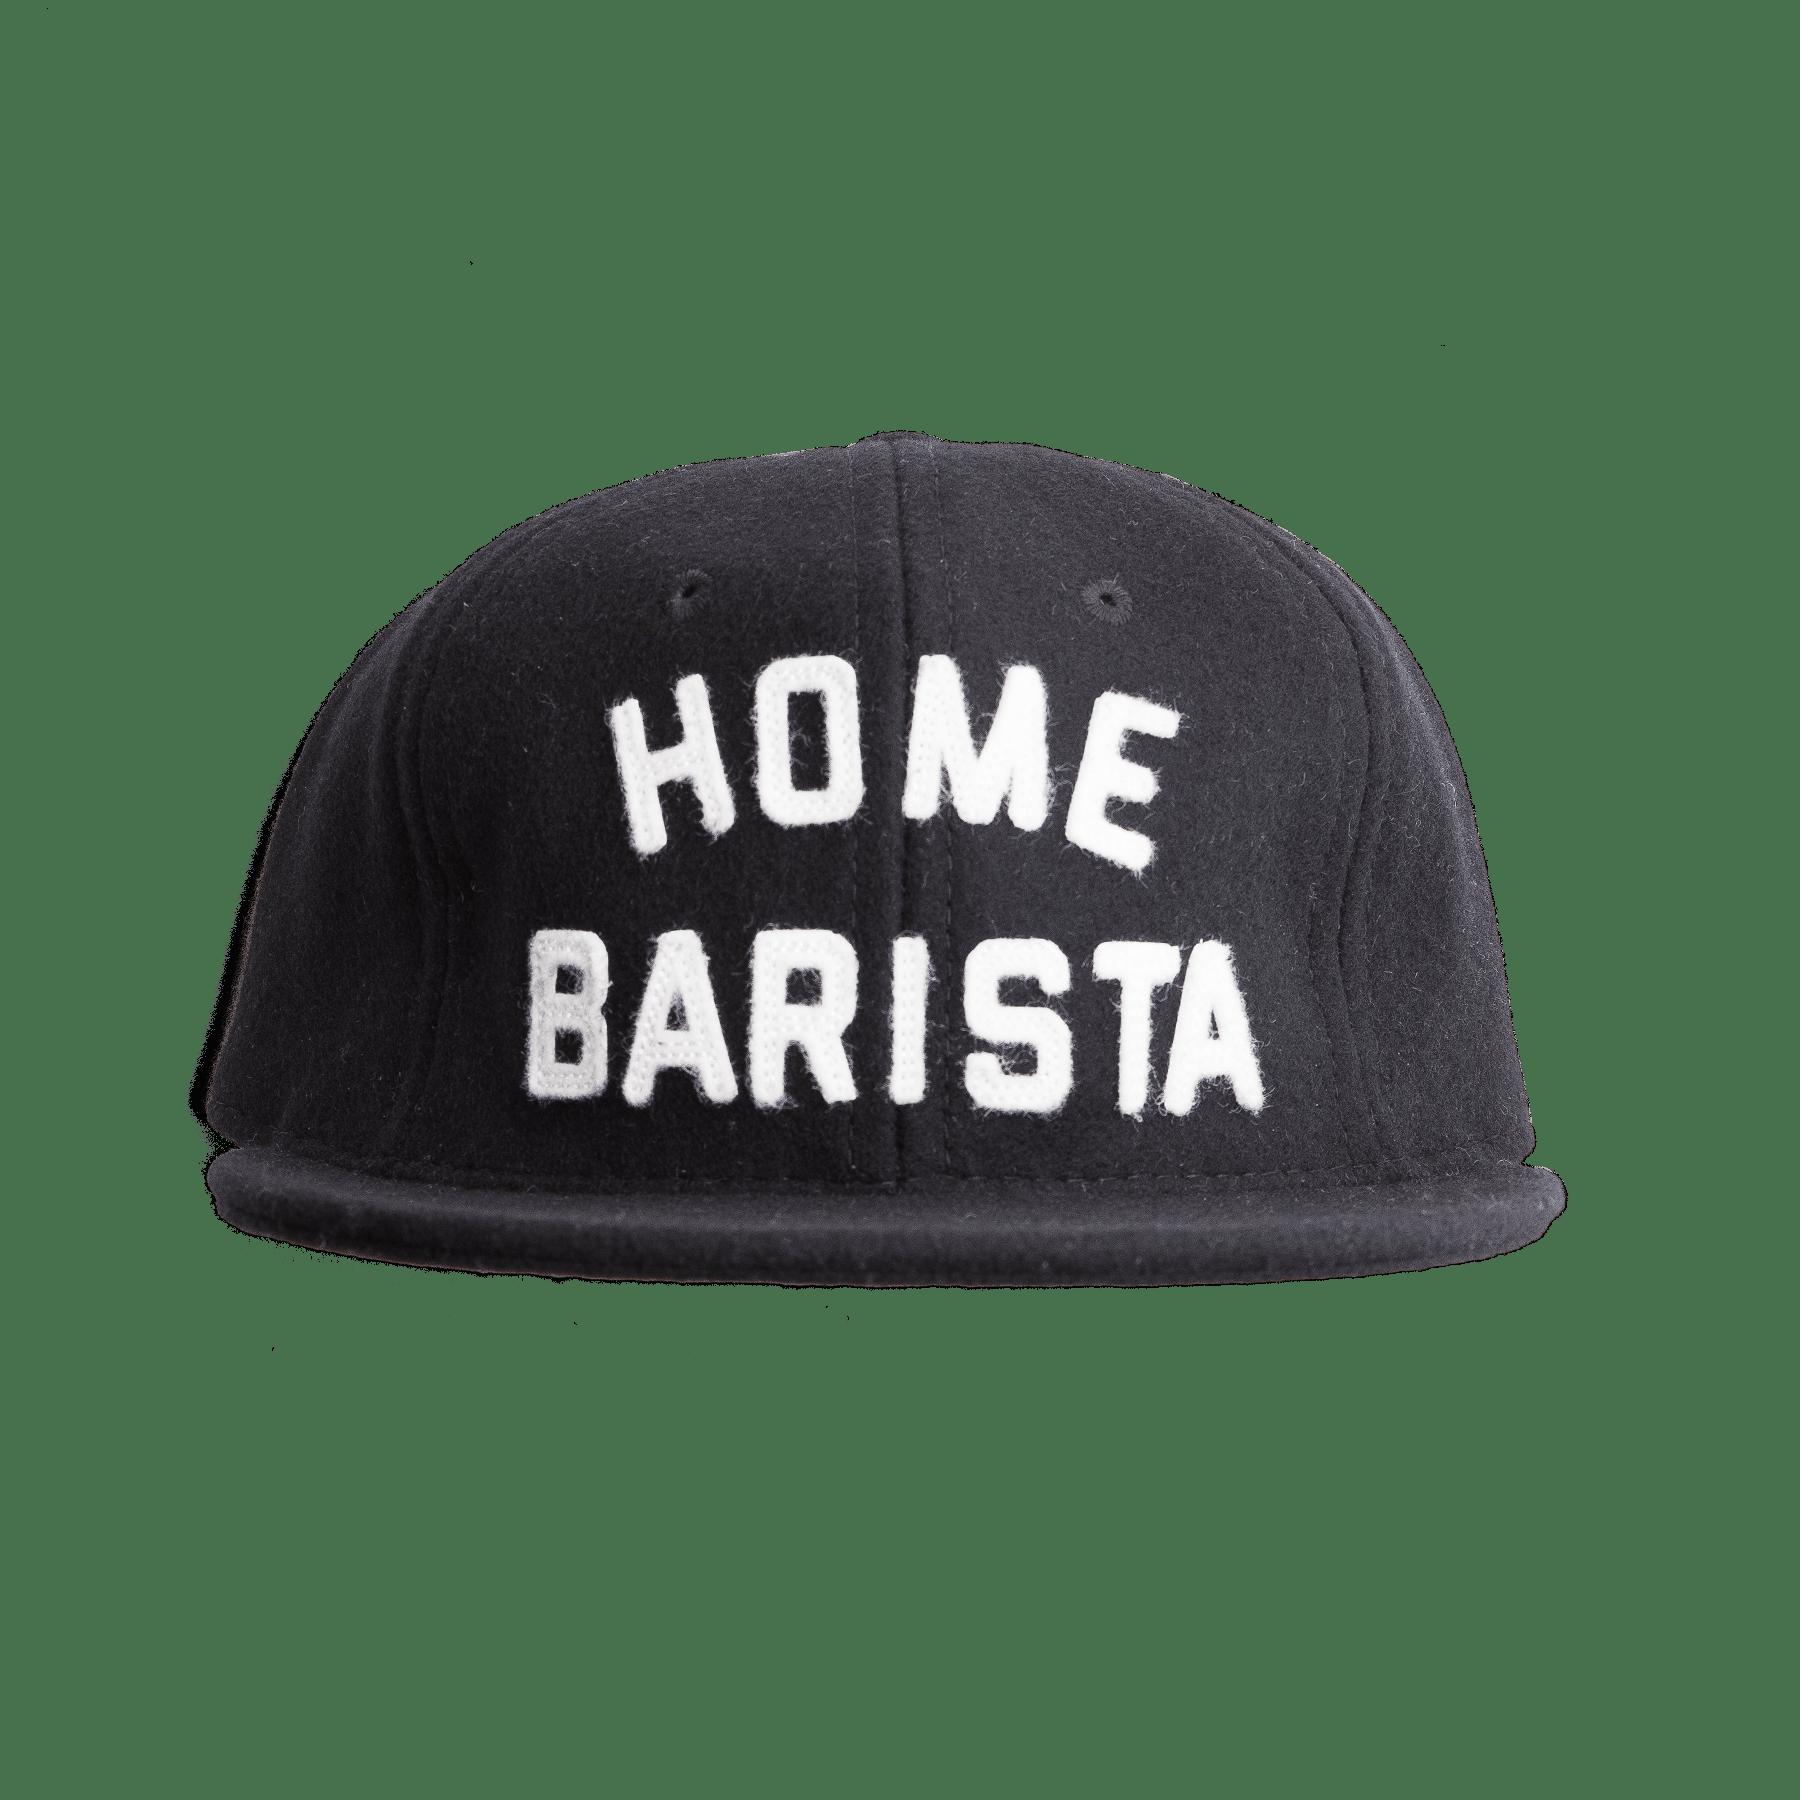 9bed0929c3f La Marzocco Home Barista Cap